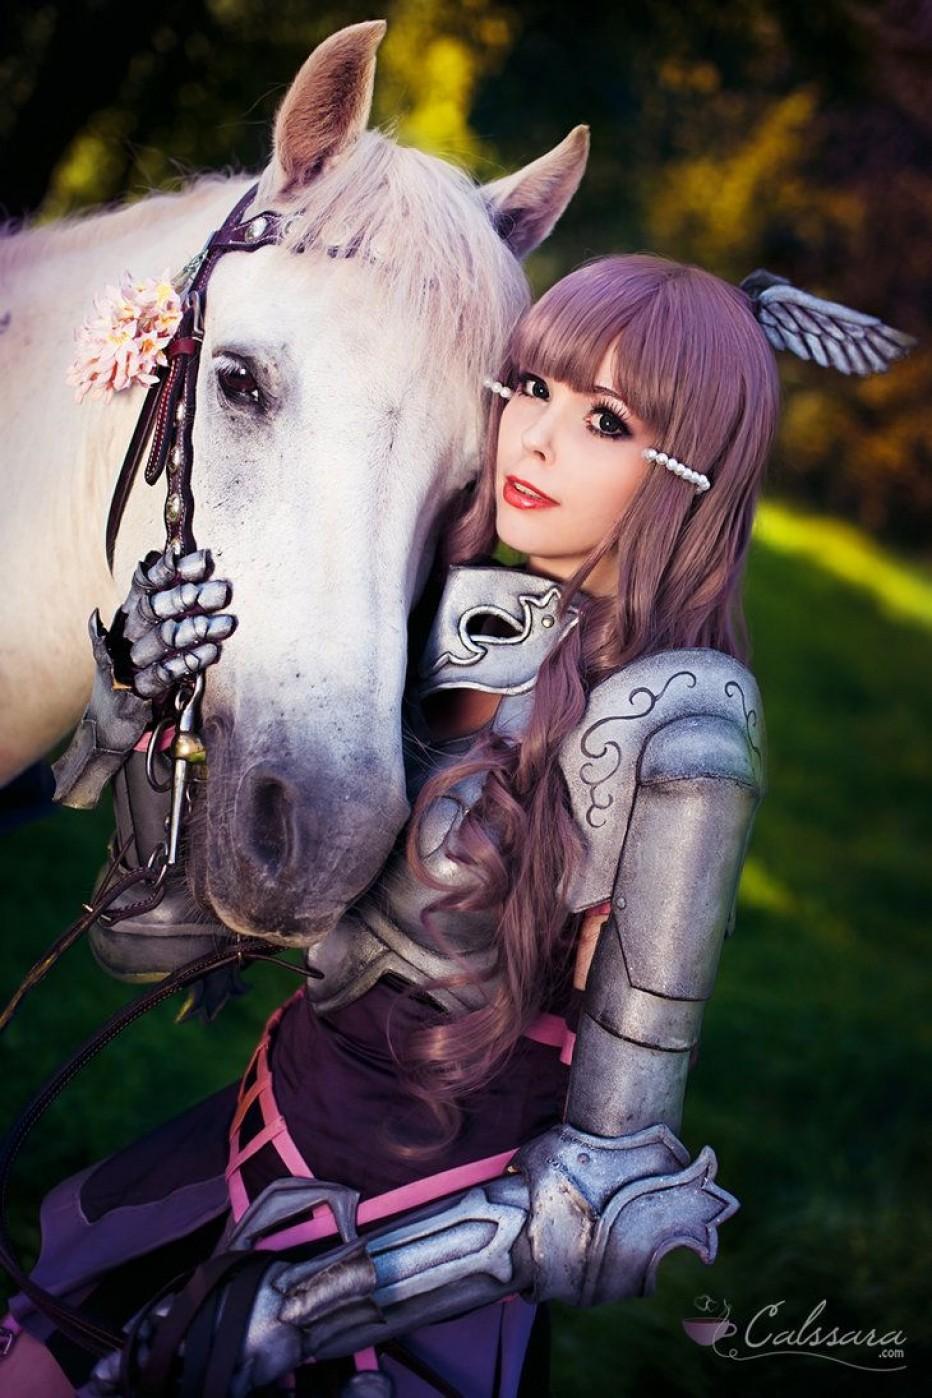 Fire-Emblem-Awakening-Sumia-Cosplay-Gamers-Heroes-6.jpg